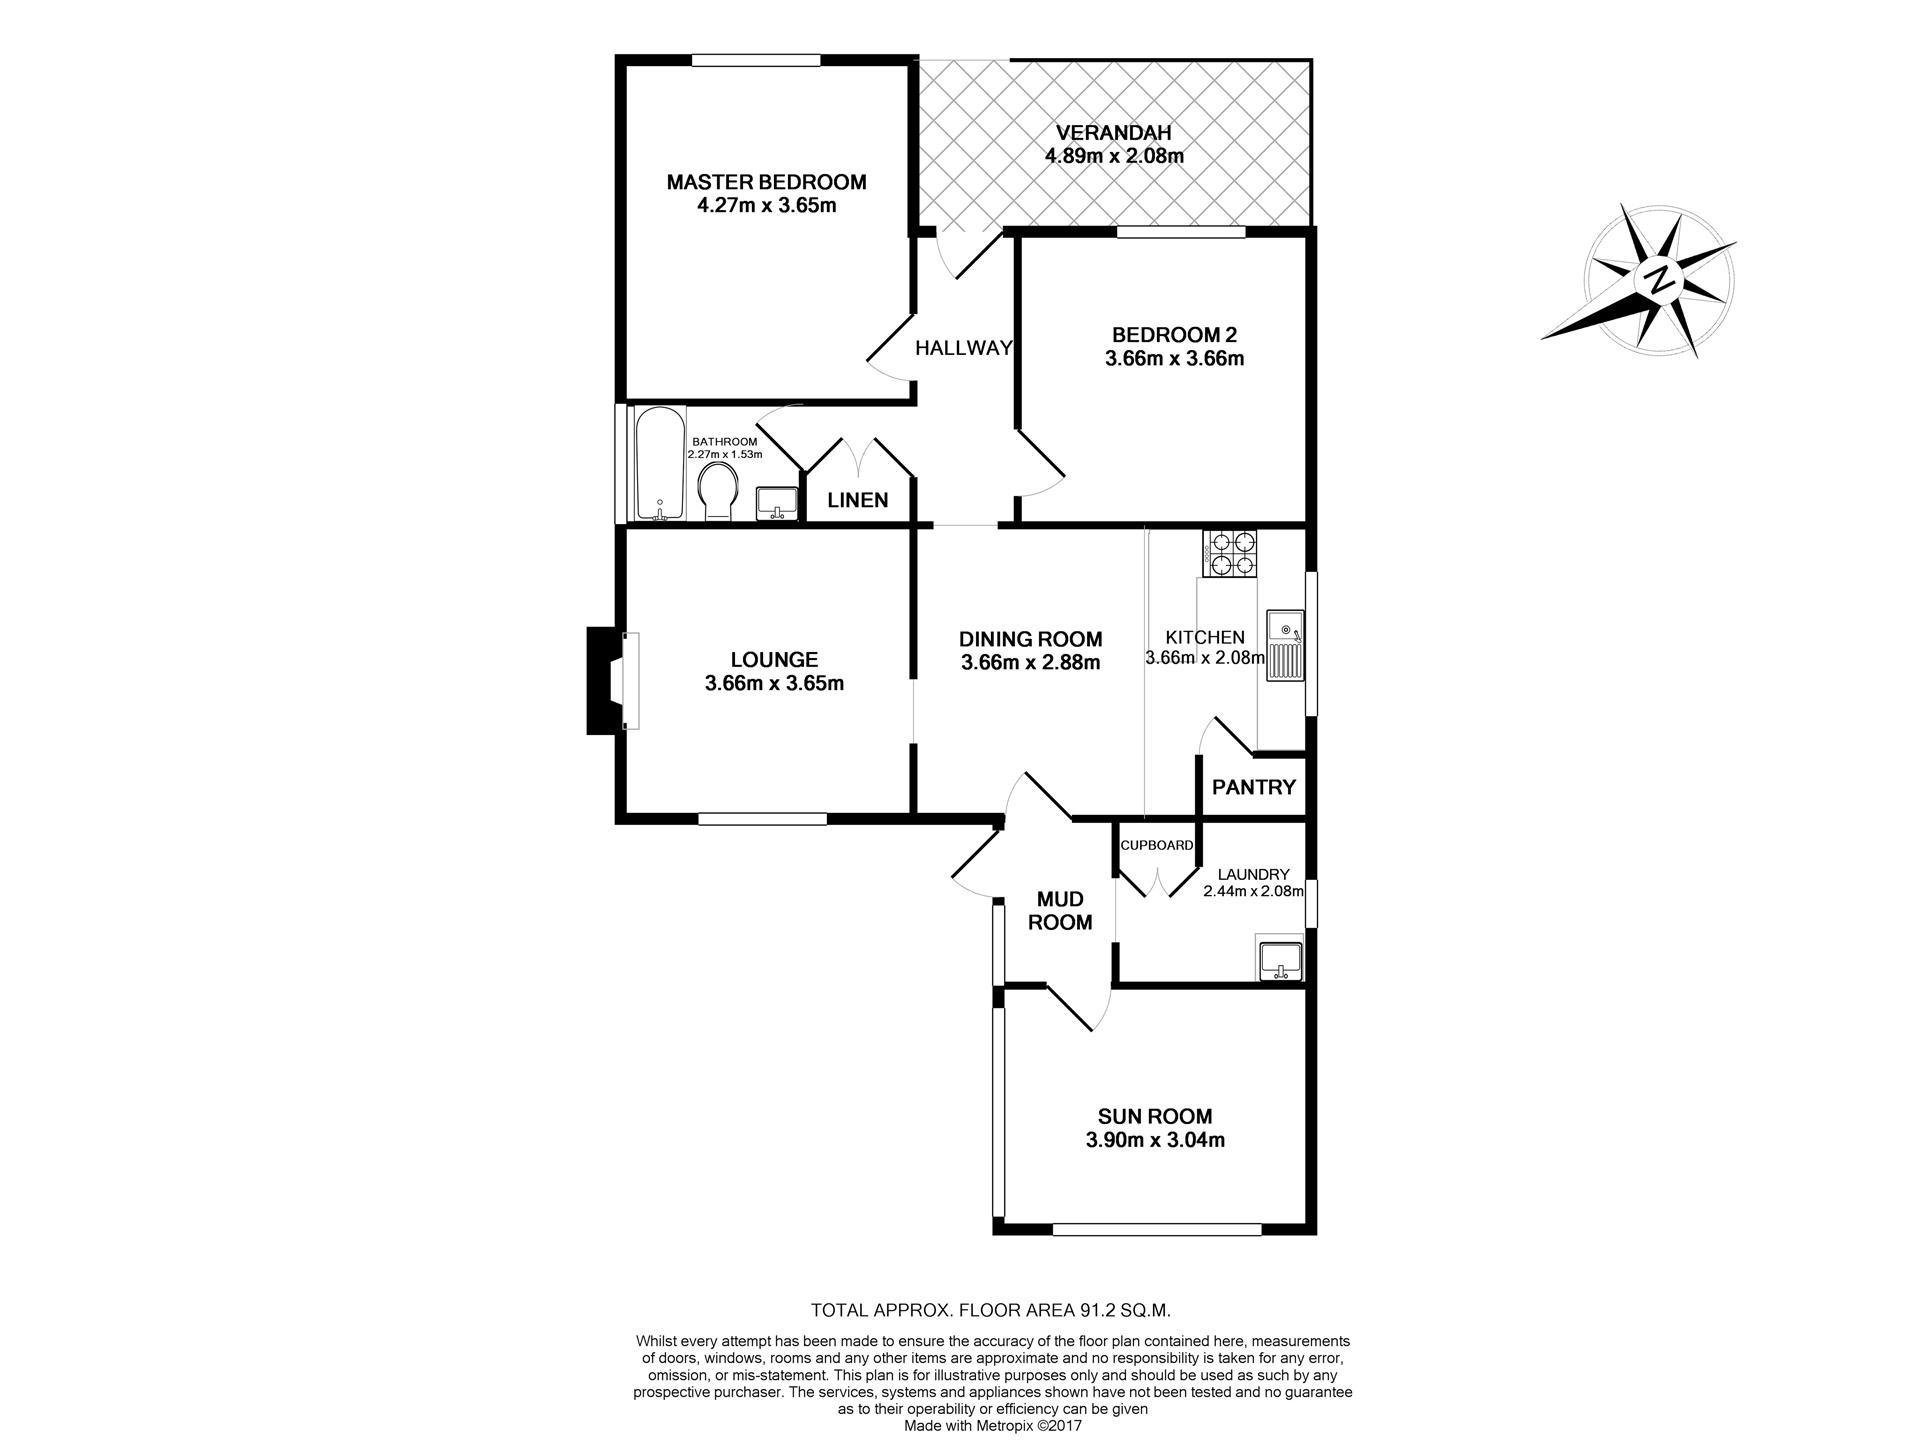 http://assets.boxdice.com.au/duncan_hill_property/listings/1742/f3d3ec12.jpg